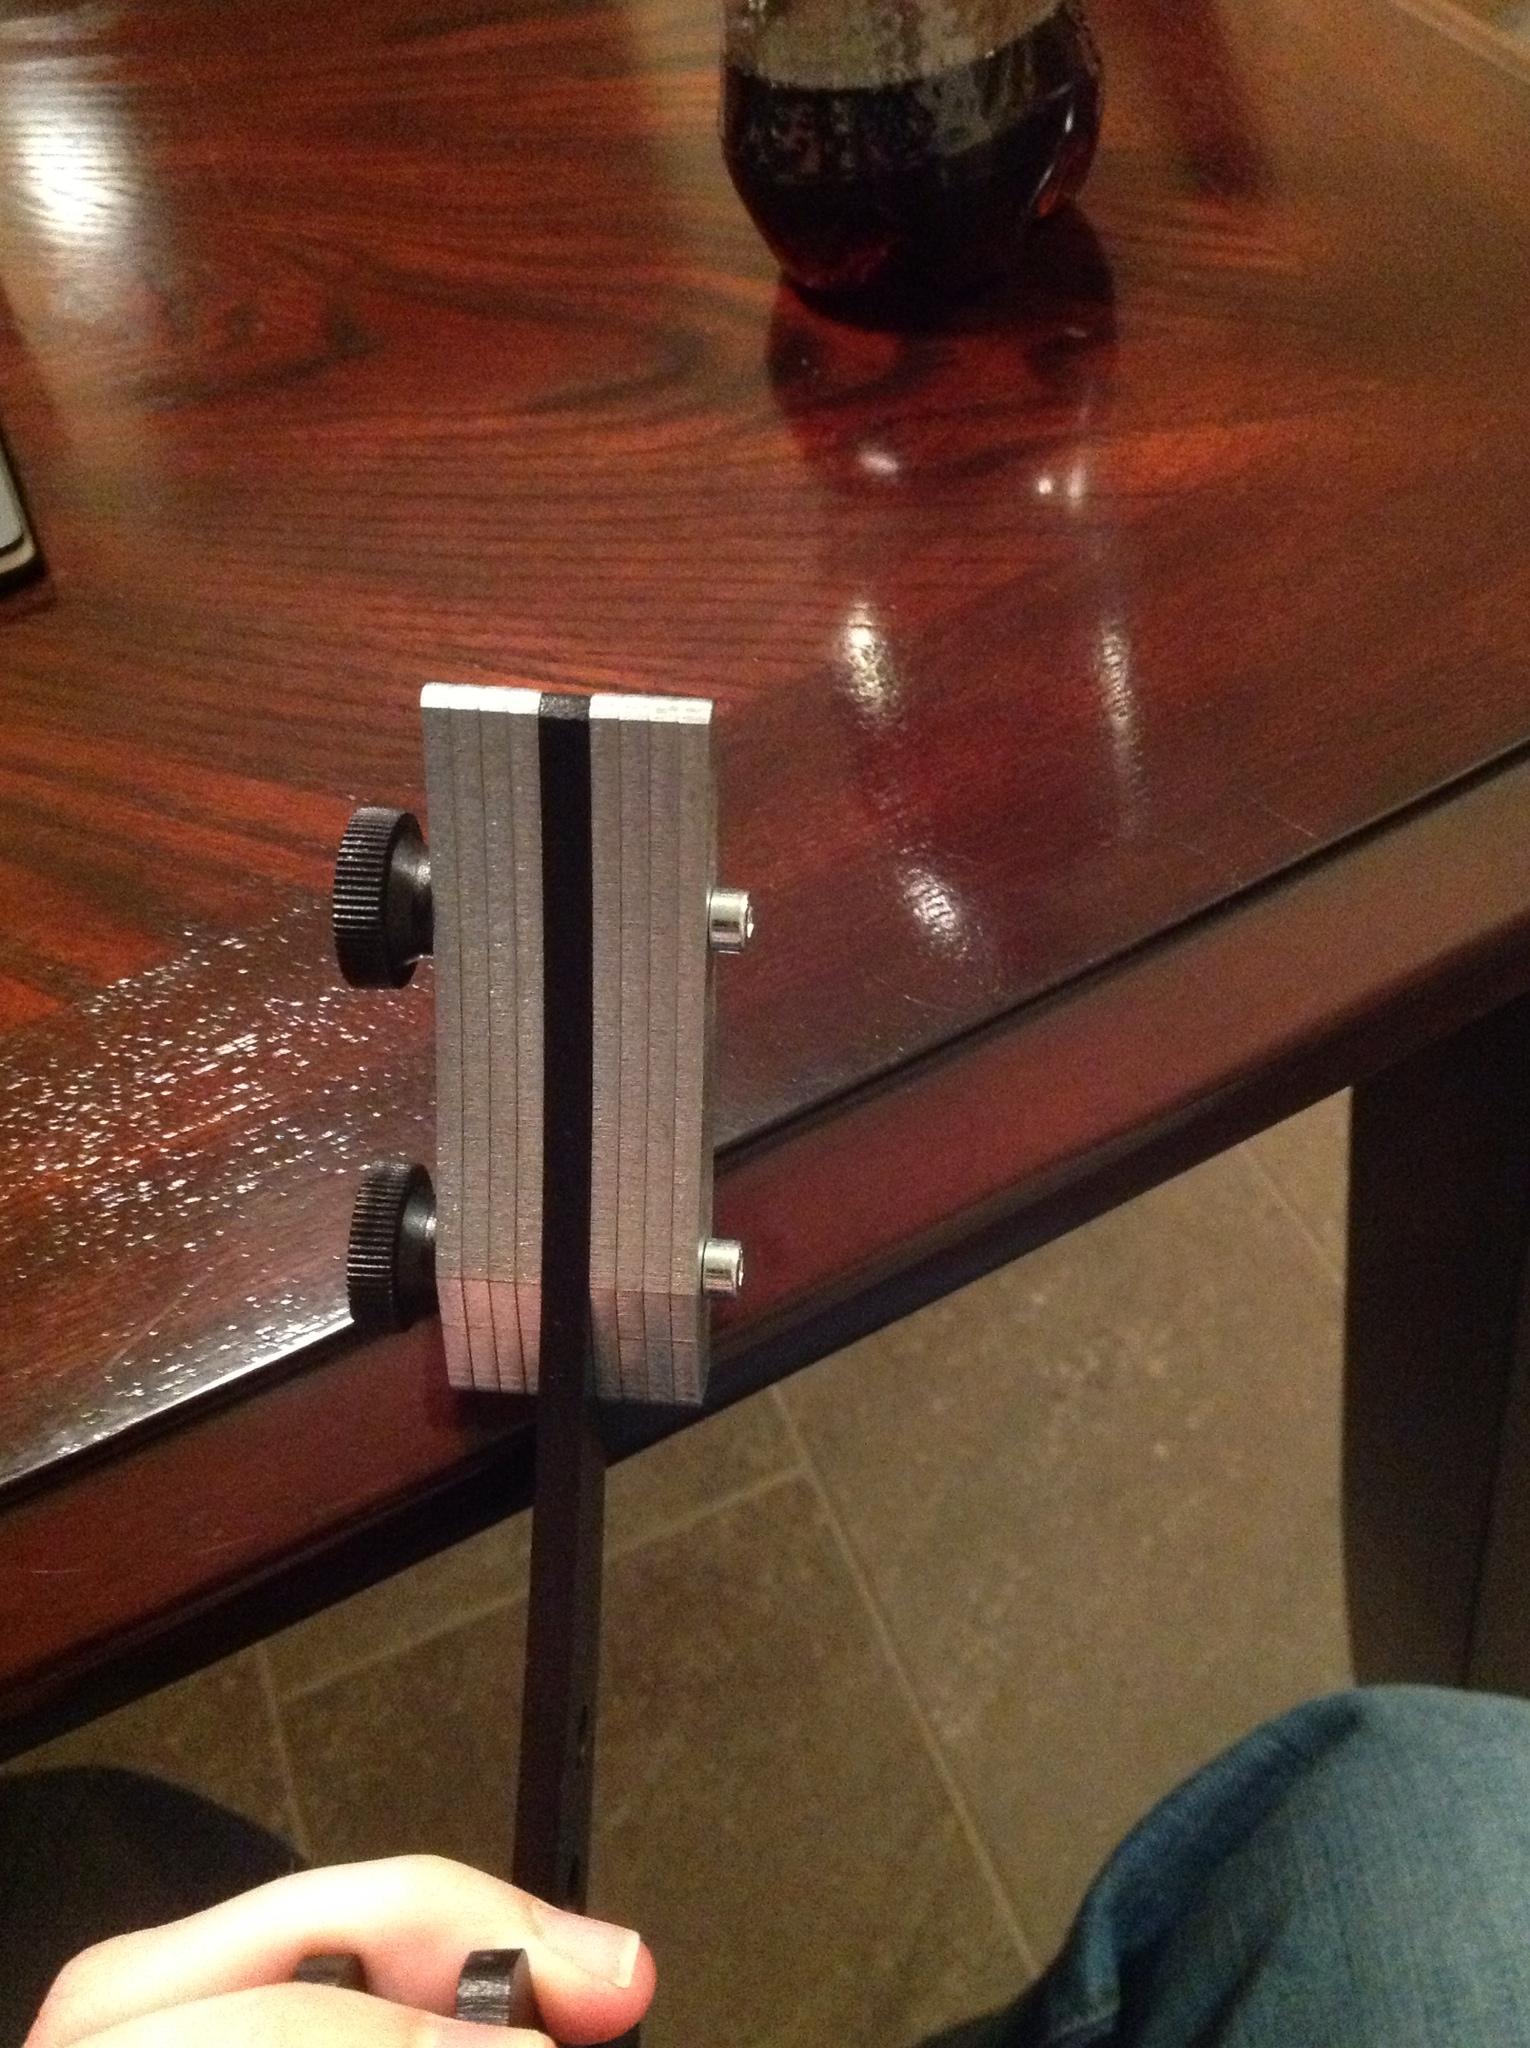 Eemov Nano Stabilizer Arm Review